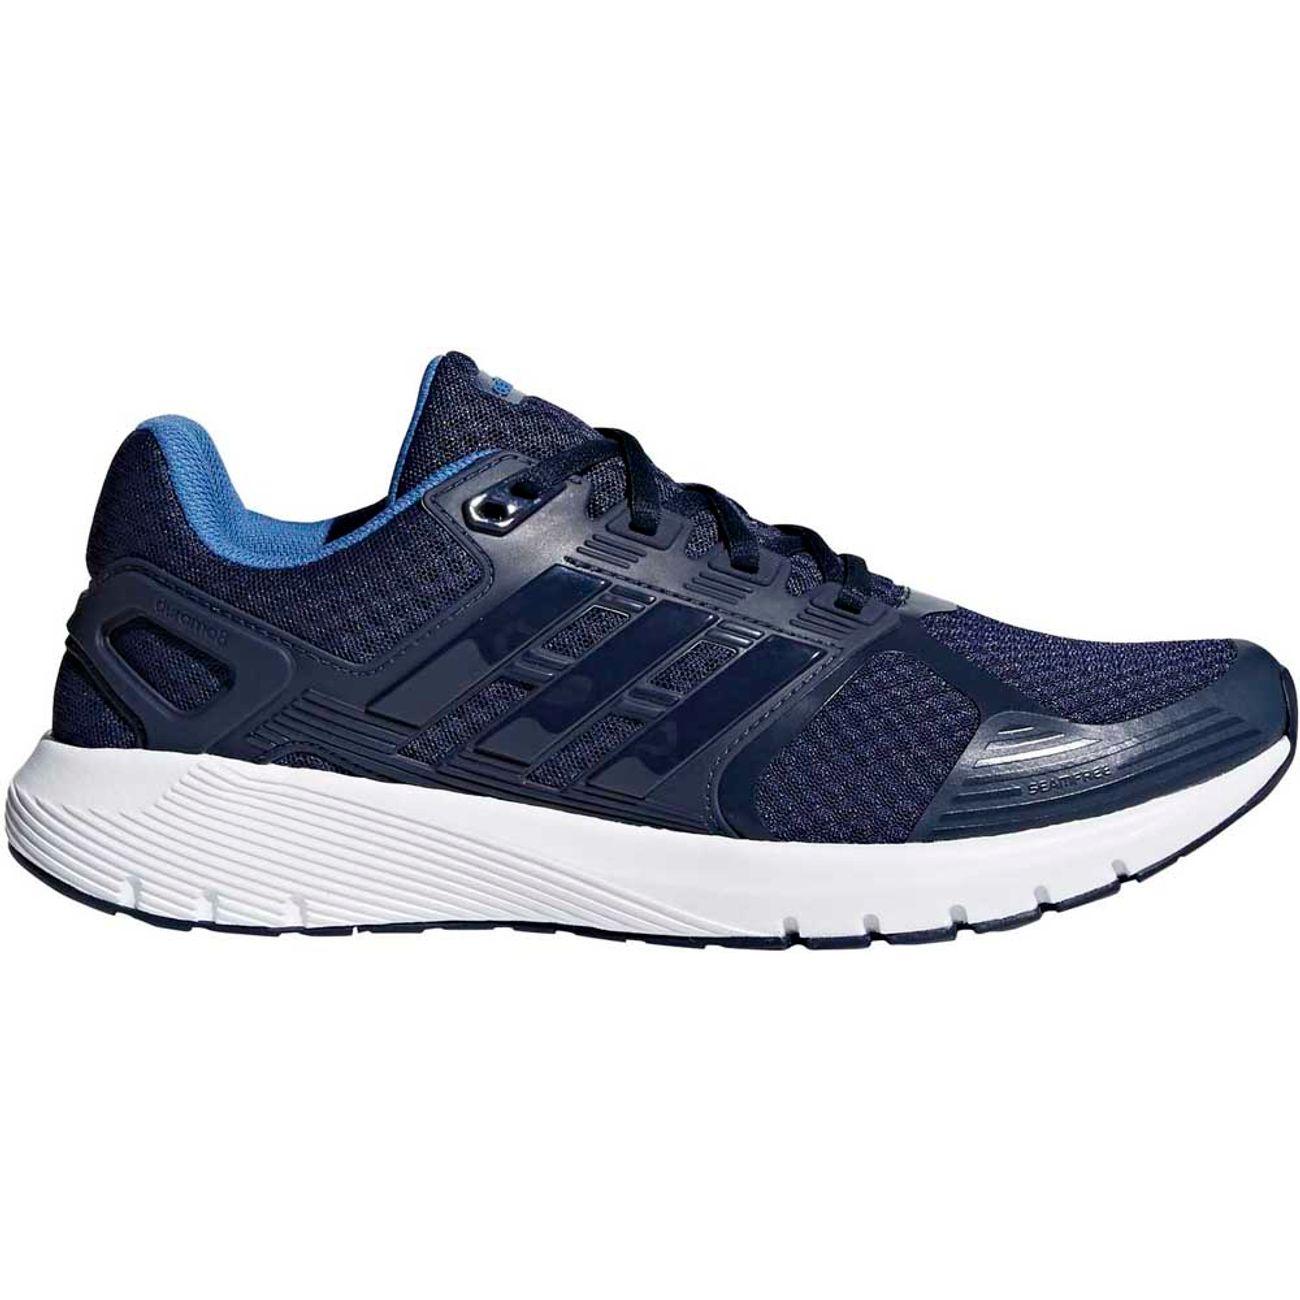 Running Homme Running Adidas Duramo Adidas 8 Running 8 Duramo Homme 8vNnym0wPO